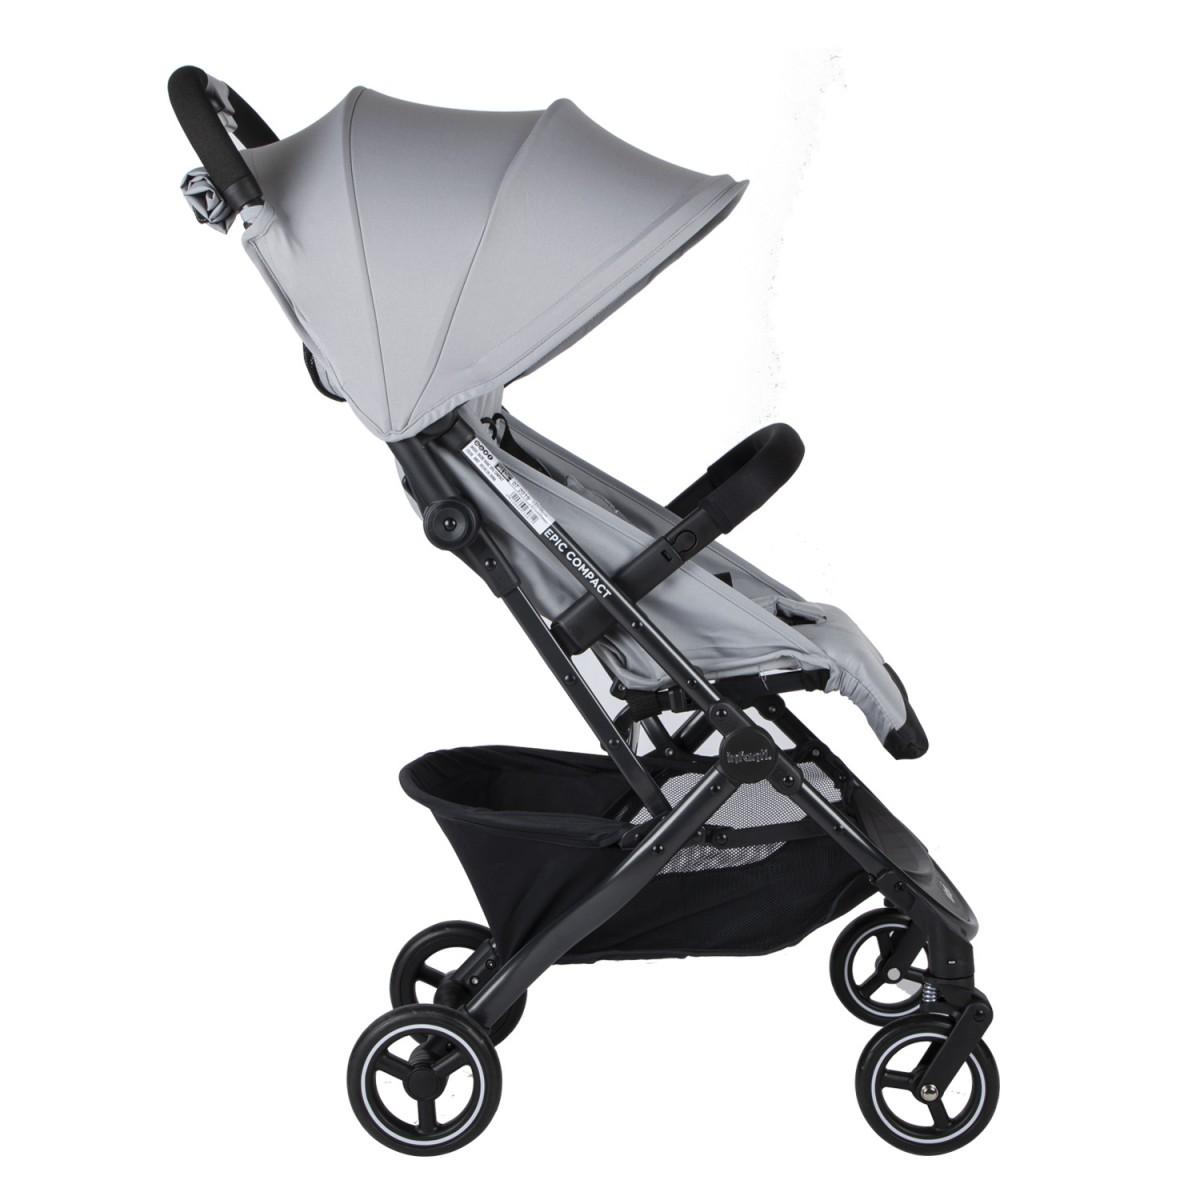 012110628bk_coche_paseo_epic_compact_grey_06